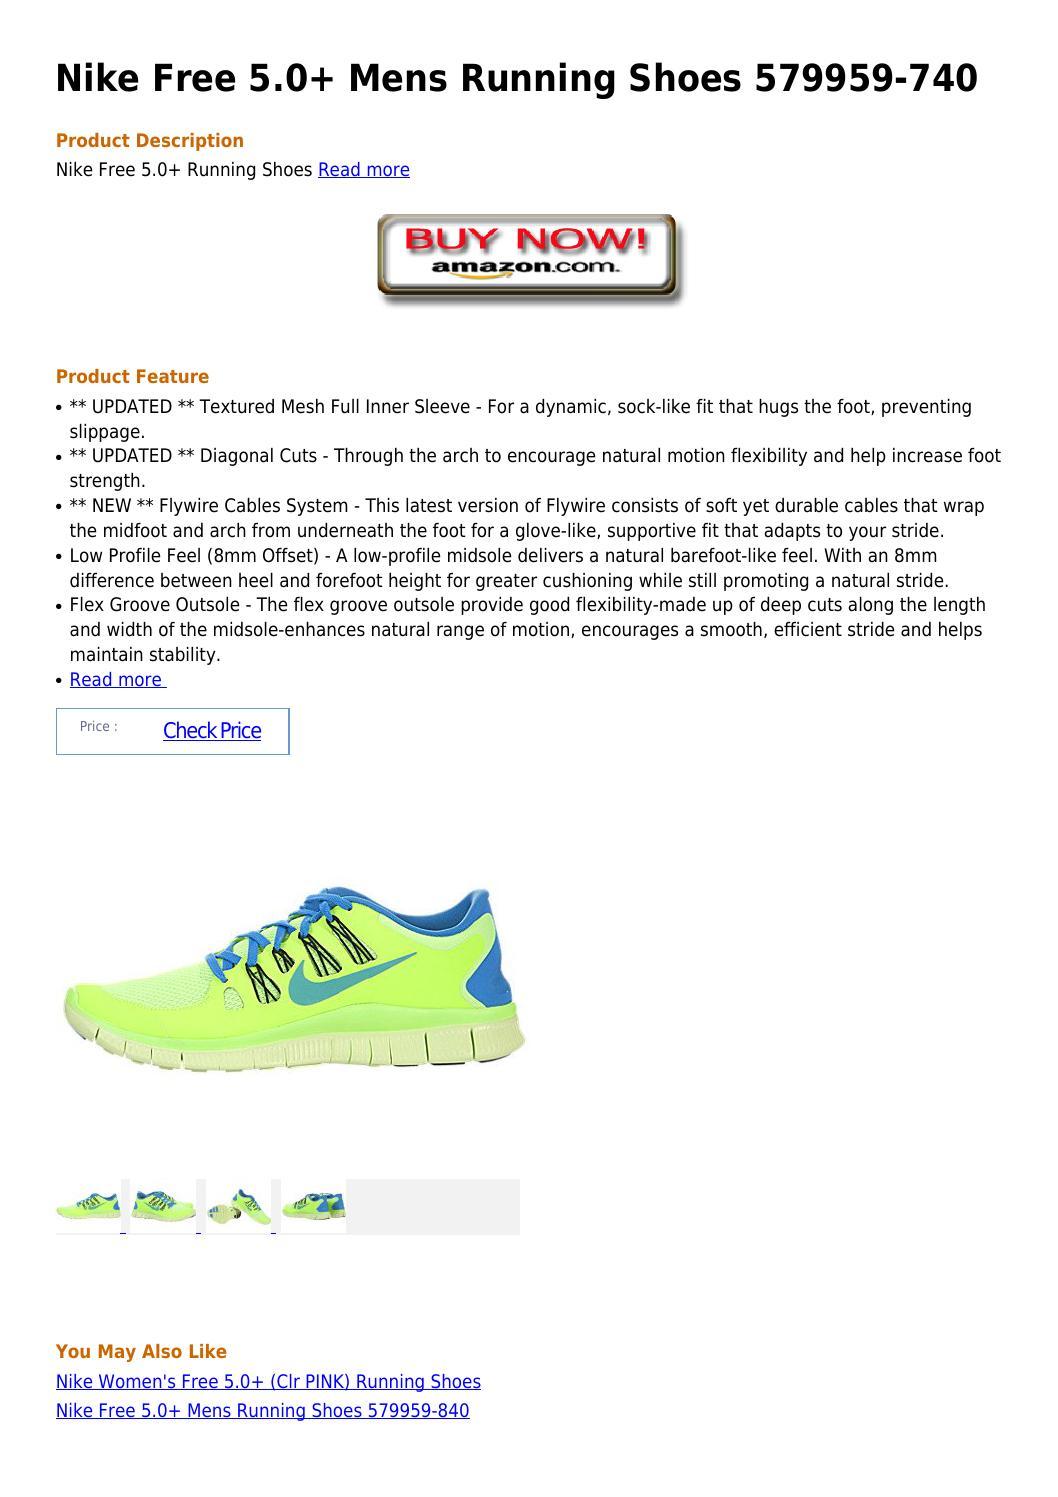 5c84648c3bb2 Nike free 5 0 mens running shoes 579959 740 by gedwardjoedoll - issuu